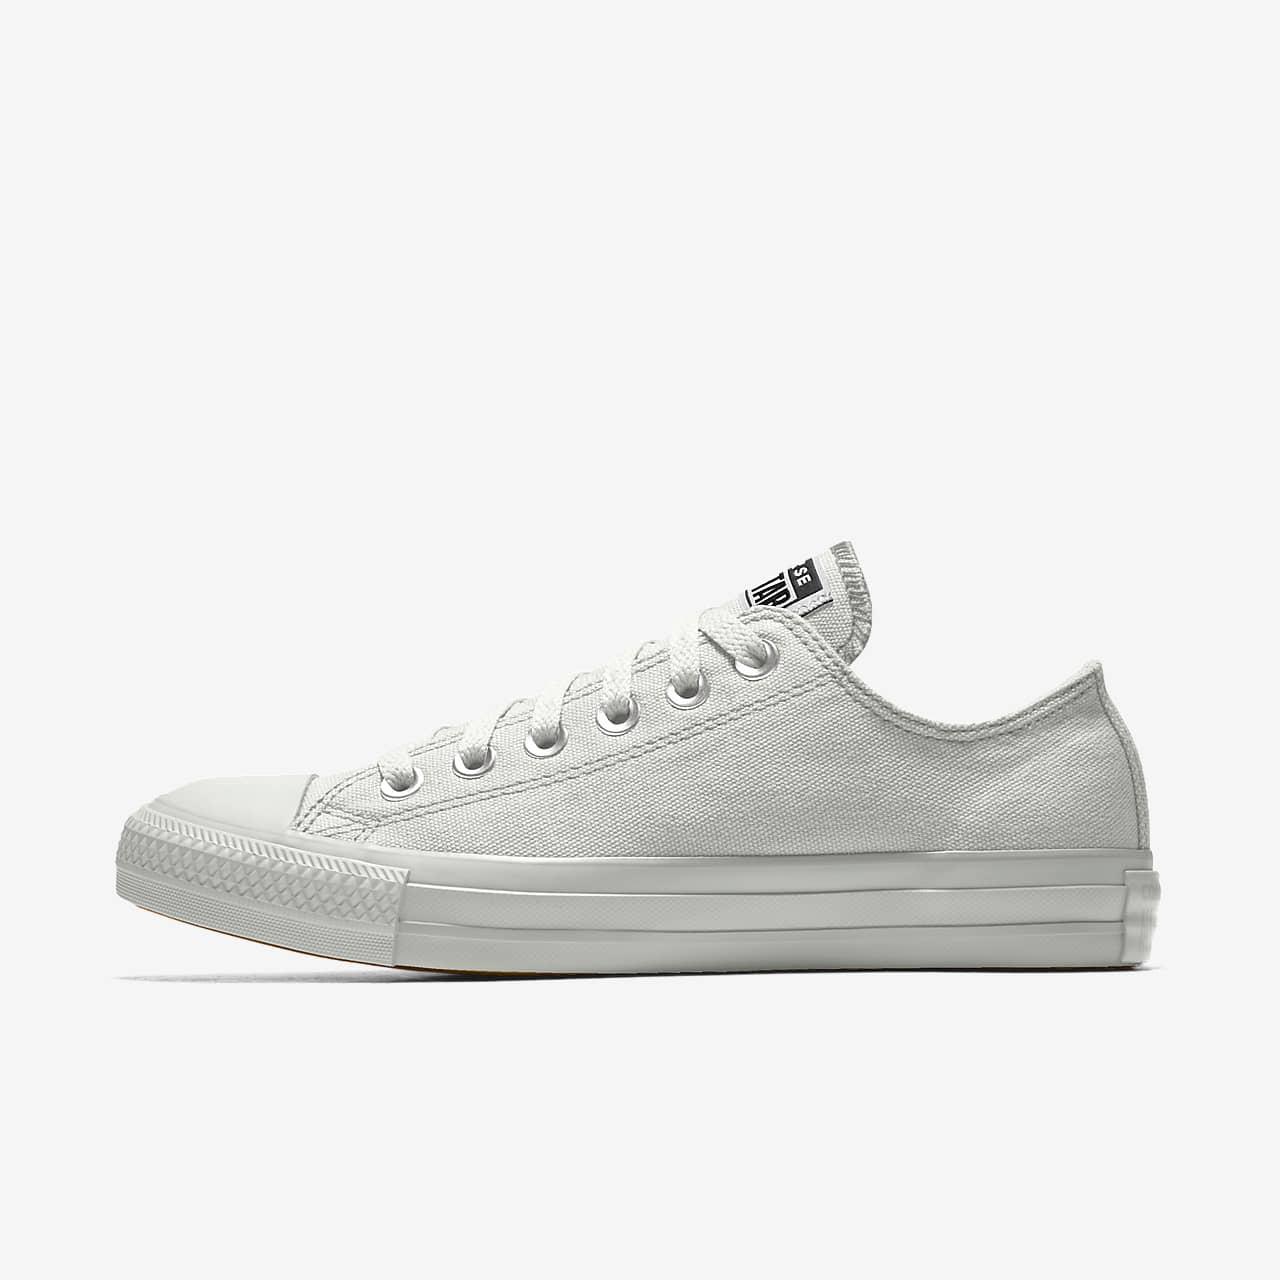 Converse Custom Chuck Taylor All Star Low Top Shoe